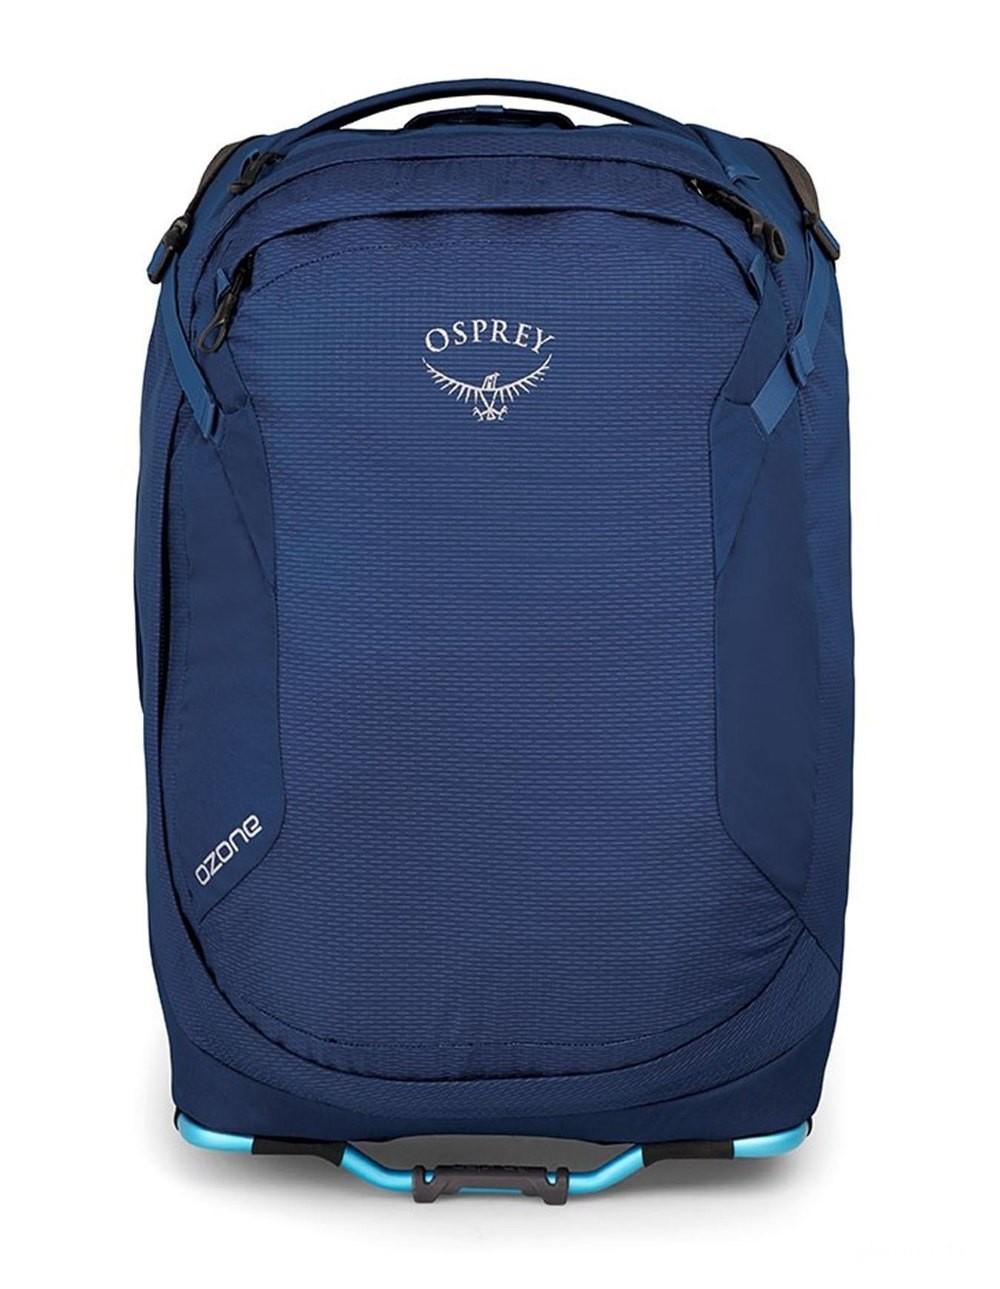 Osprey Sac de voyage Cabine - Ozone 42 Buoyant Blue